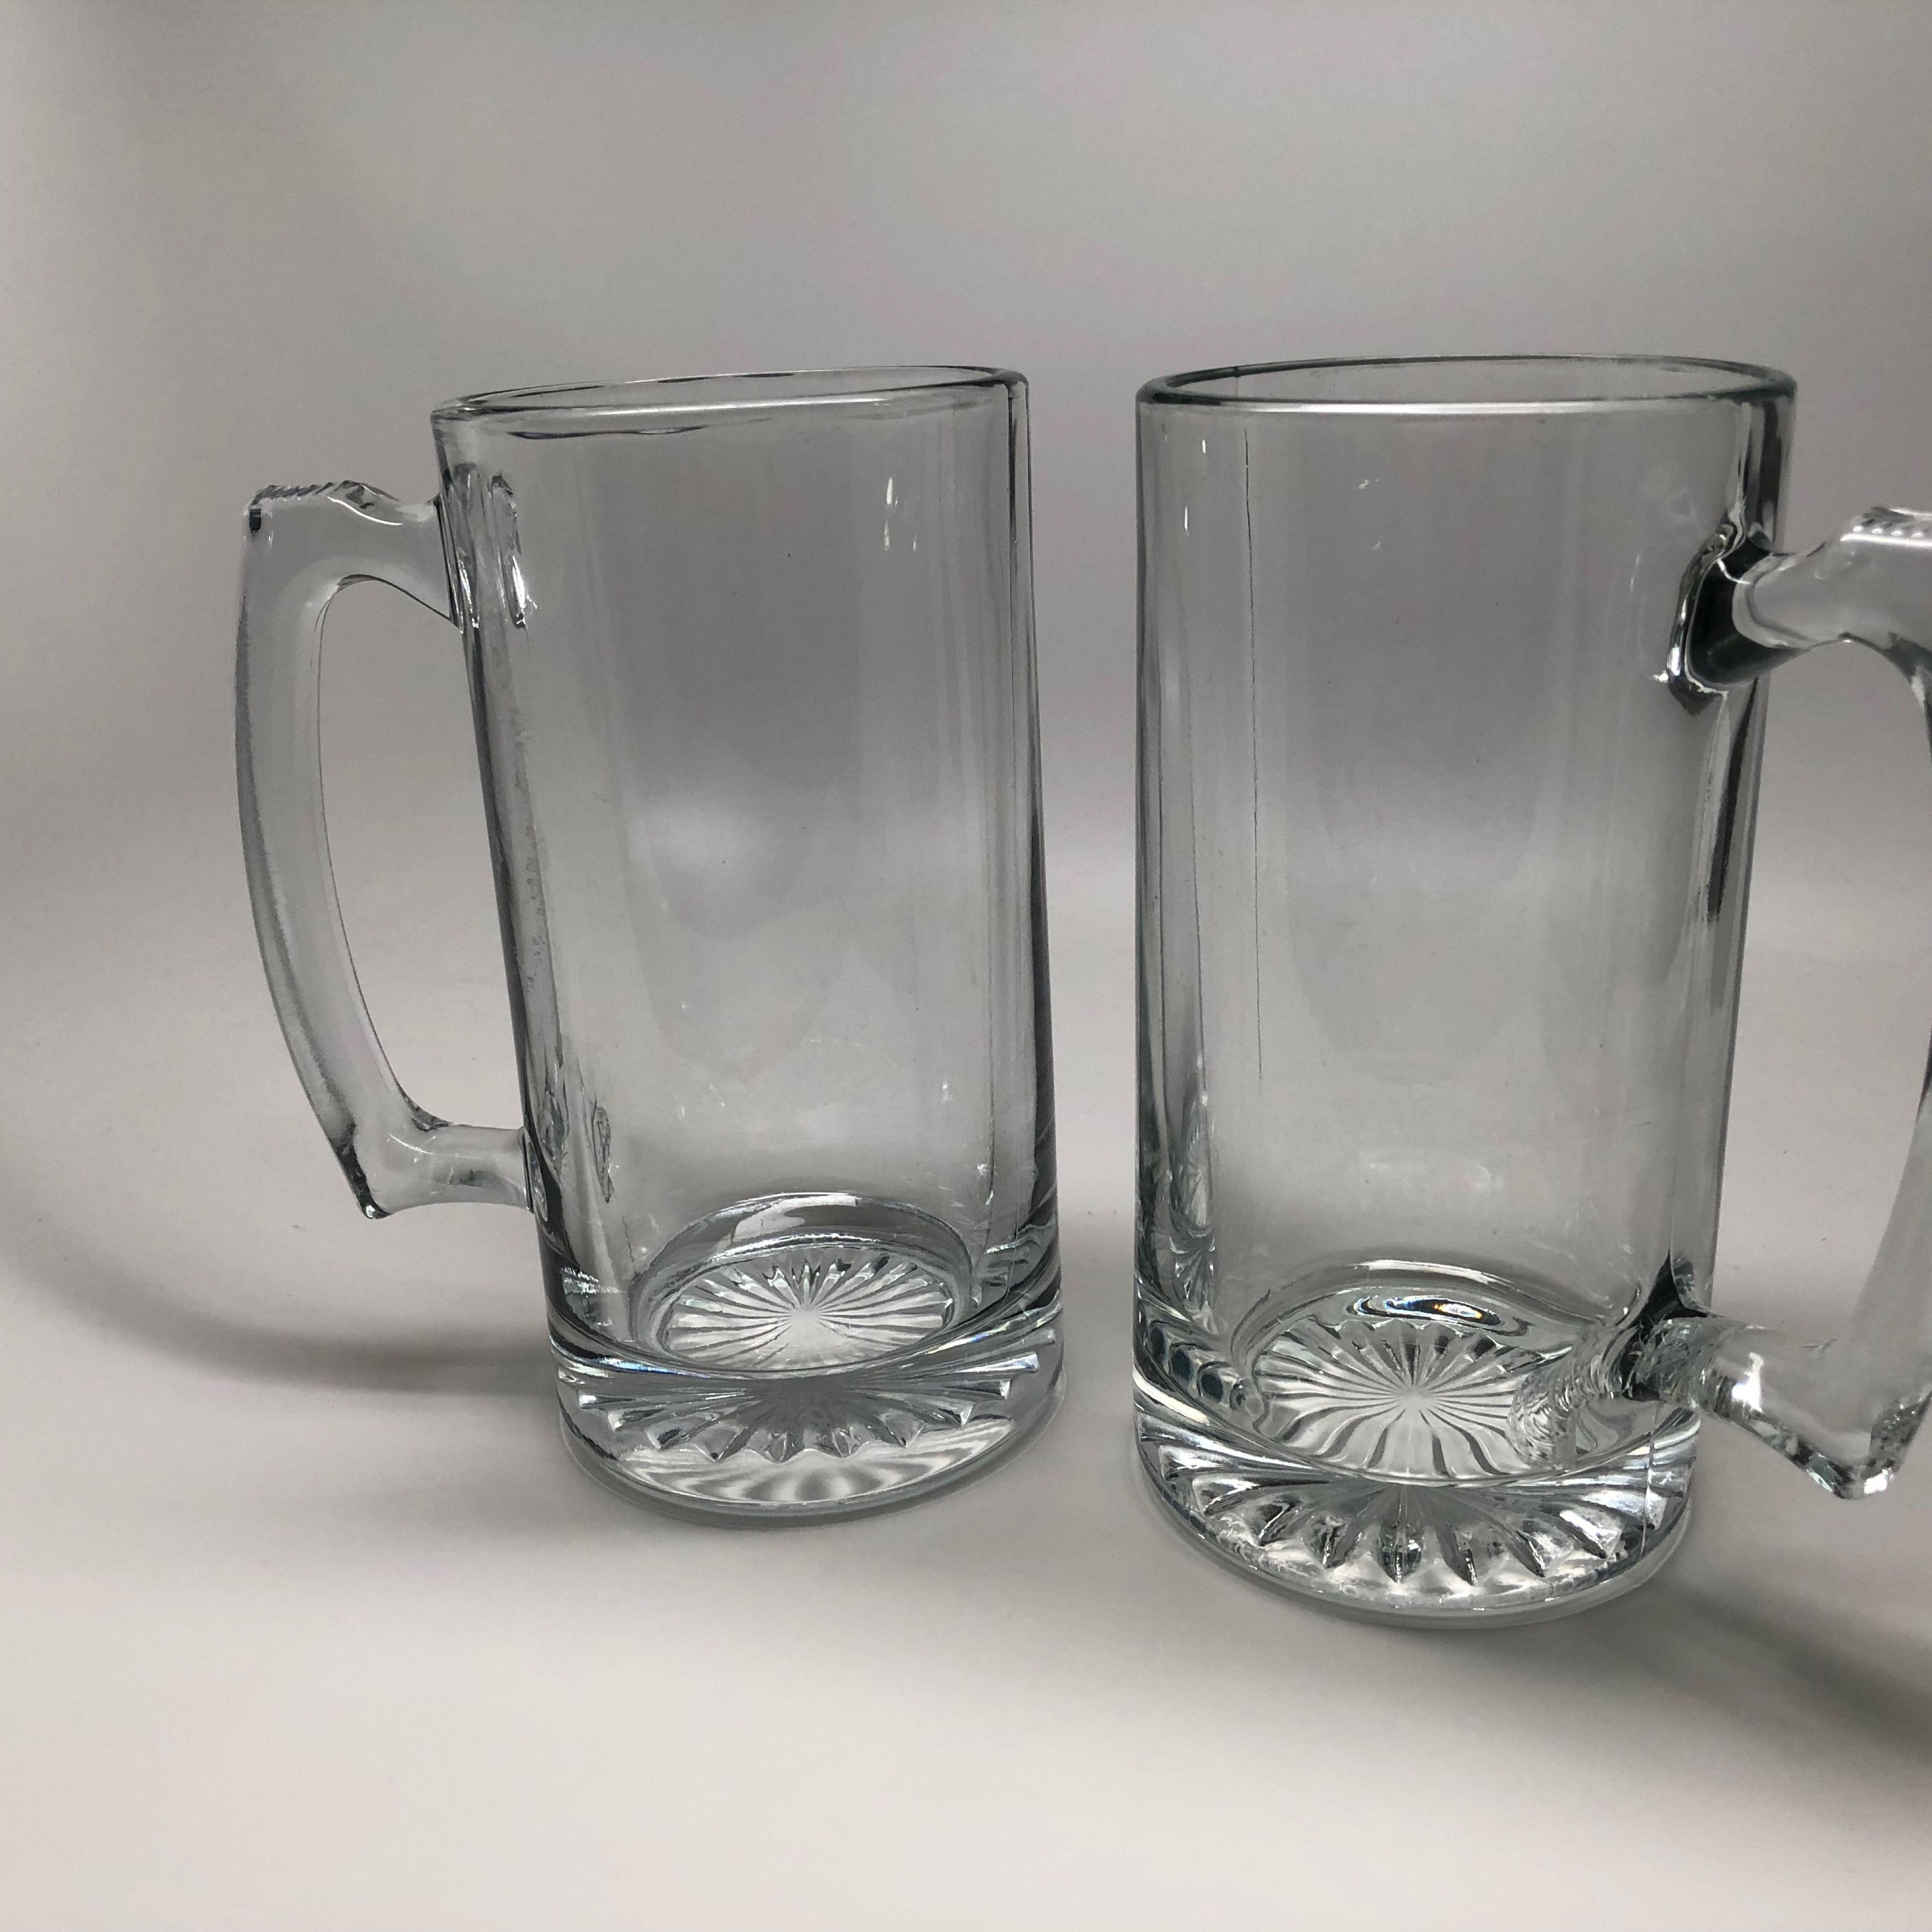 2 Large Glass Mugs Glass Beer Mugs Mugs Beer Glass